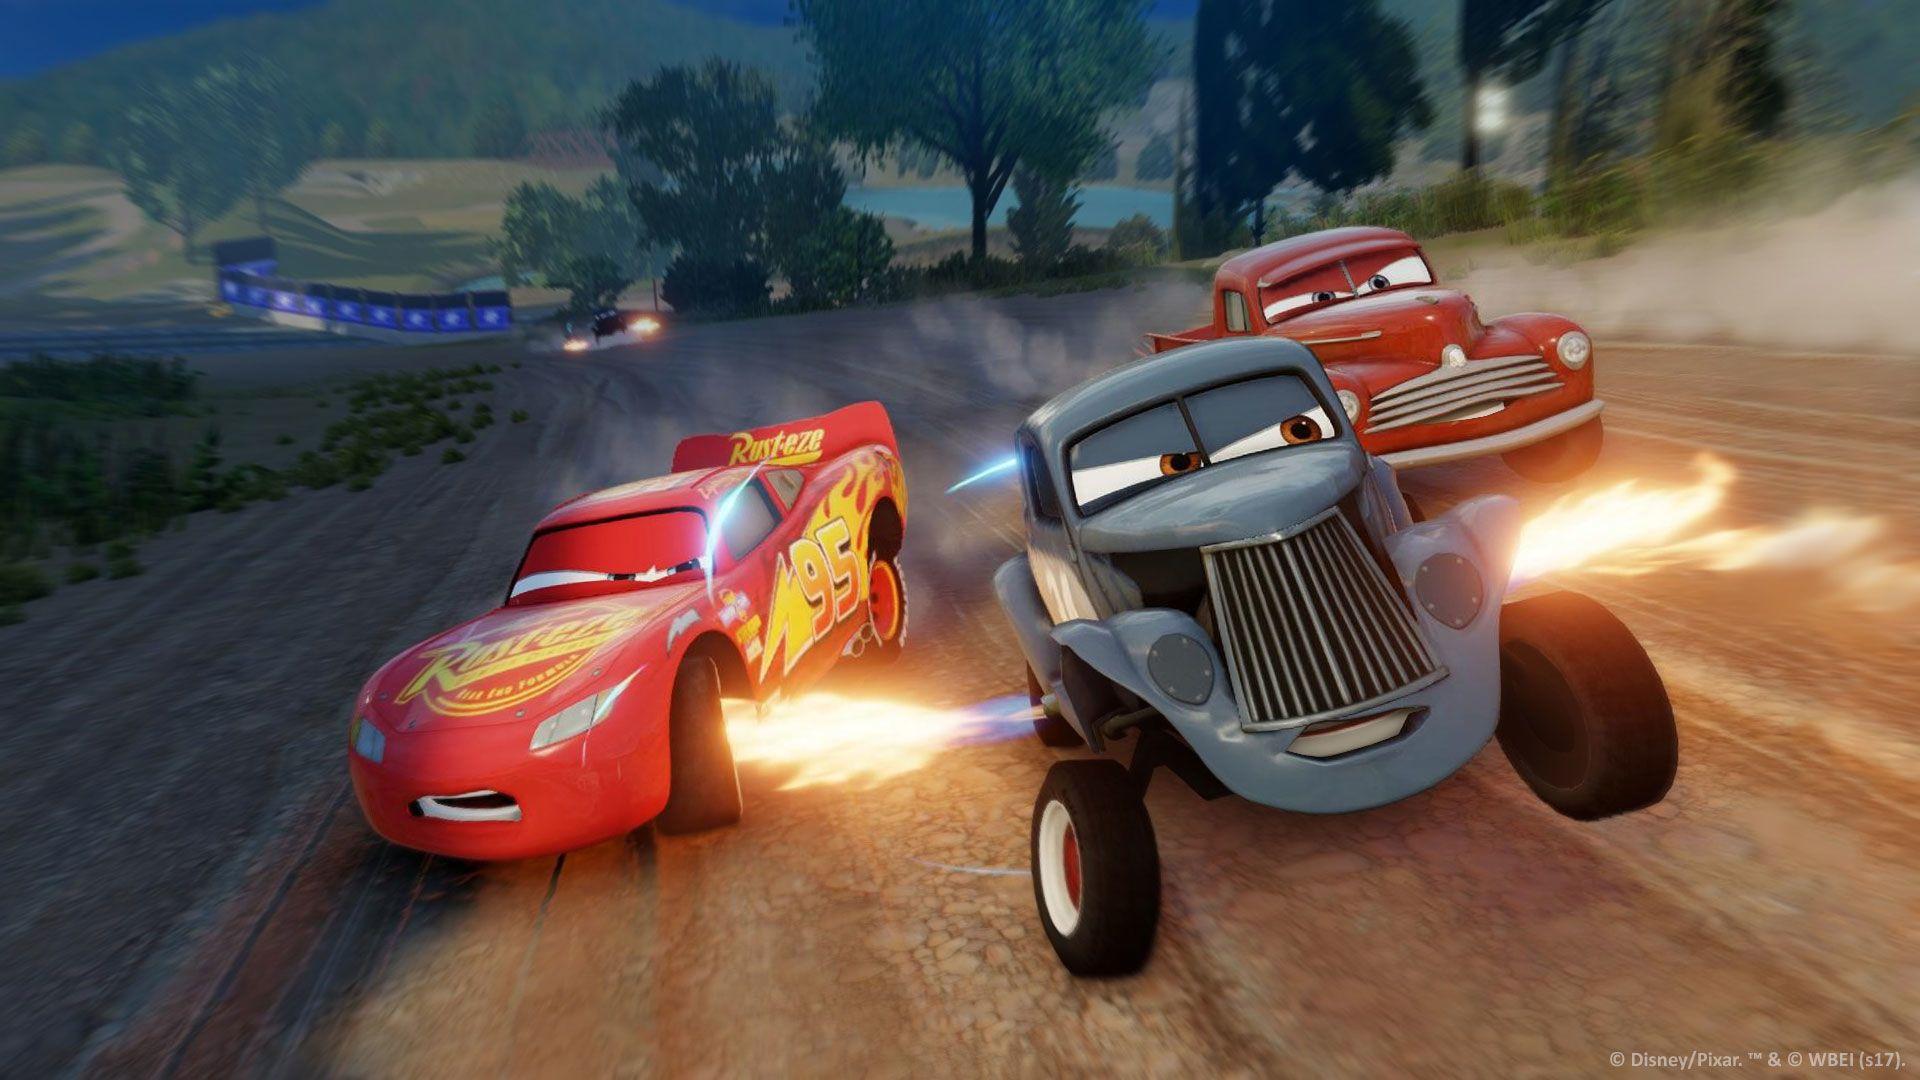 لعبة cars 3 driven to win ps3